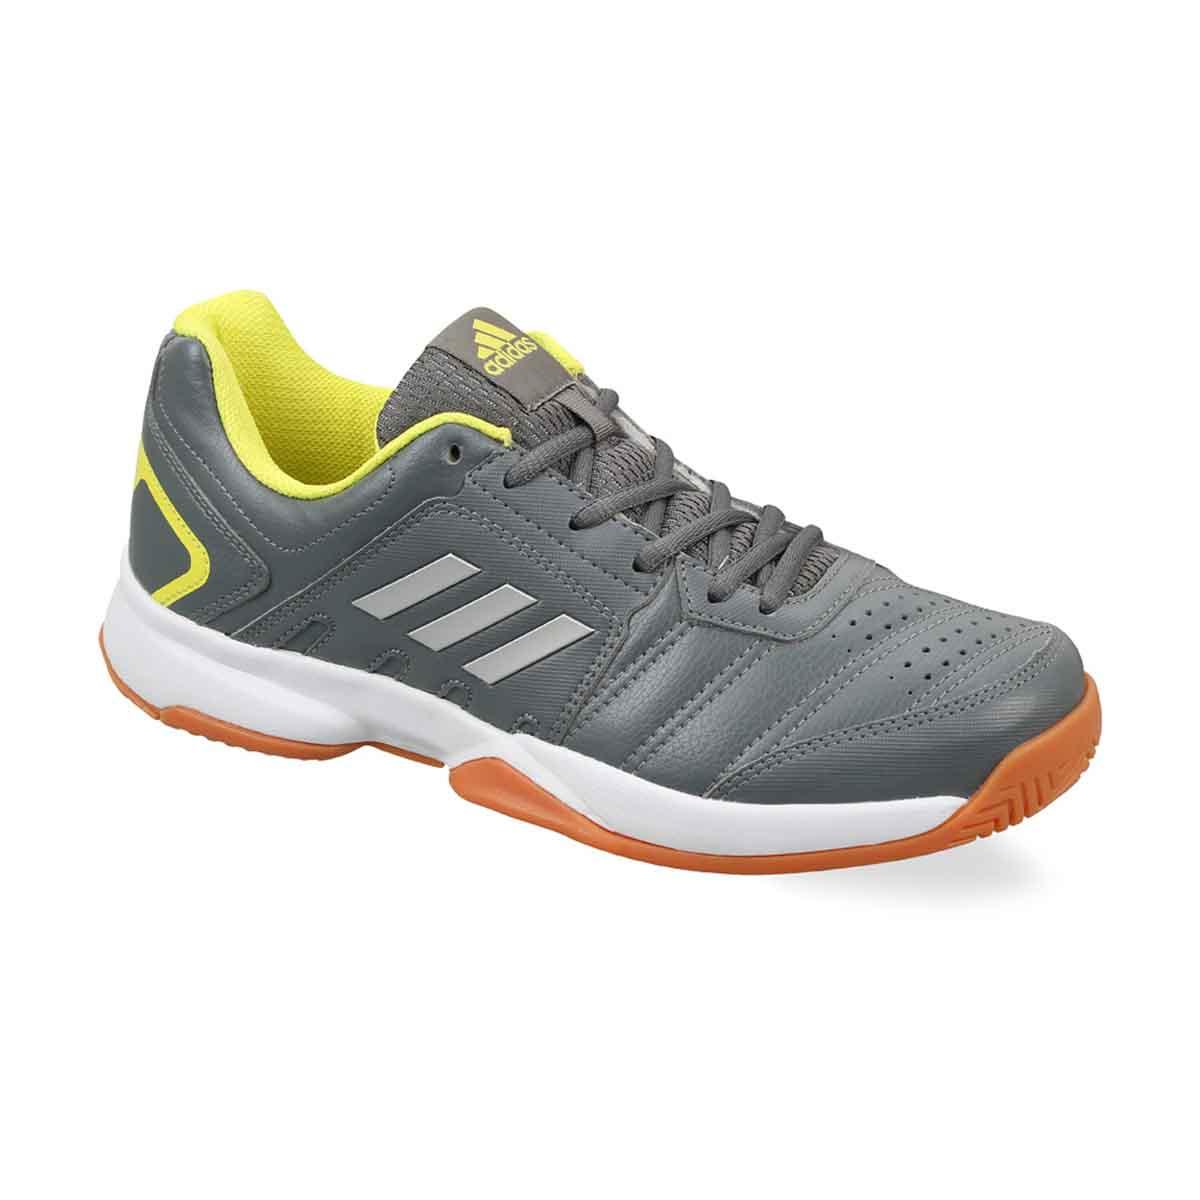 Buy Online India 2 Adidas Shoes Baseliner Indoor Court 848Wqrv